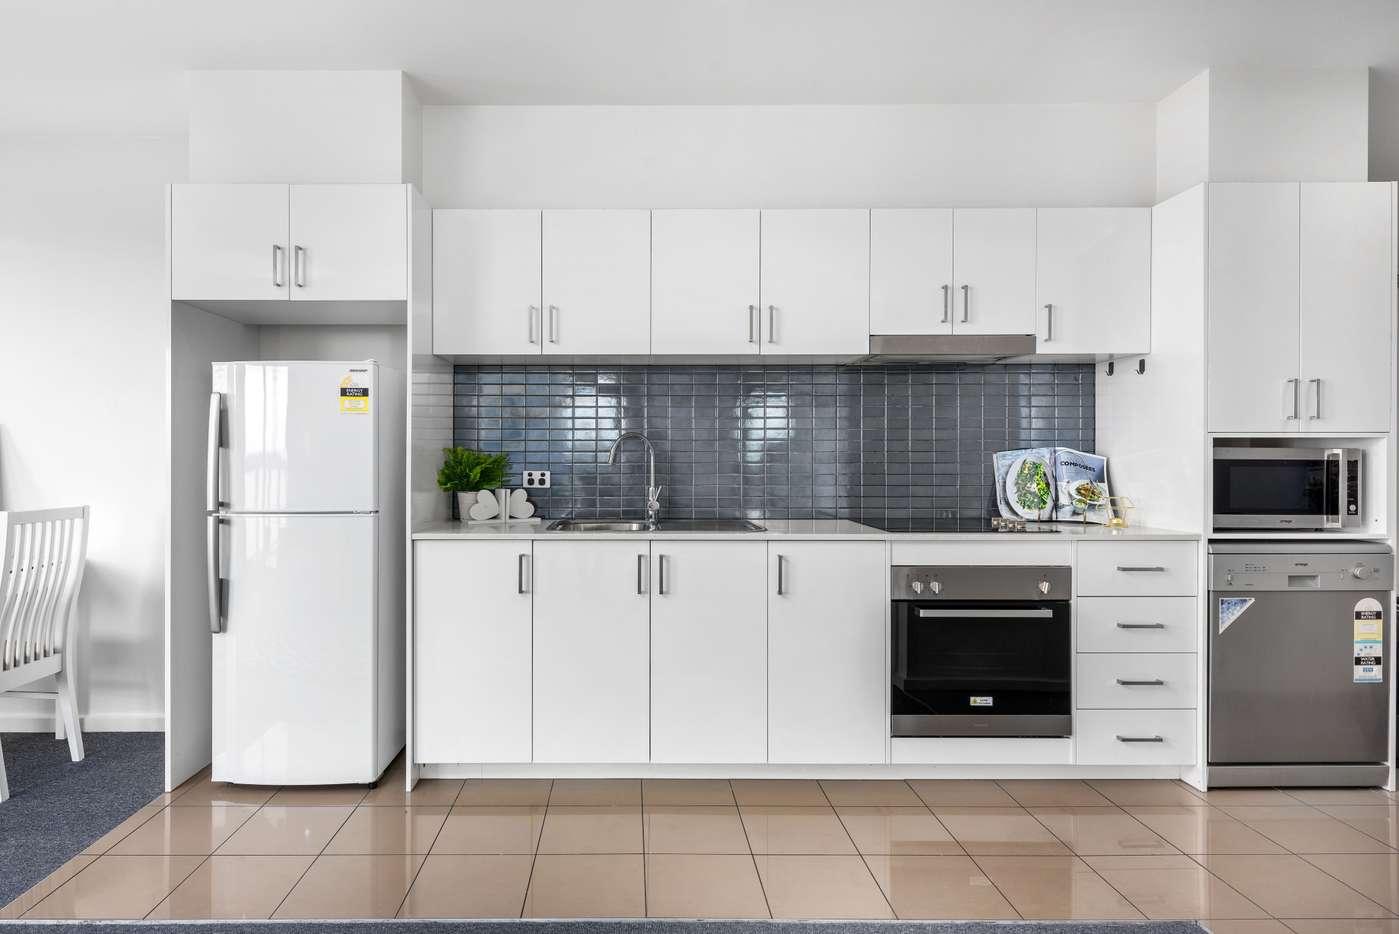 Main view of Homely apartment listing, 308/1320 Plenty Road, Bundoora, VIC 3083